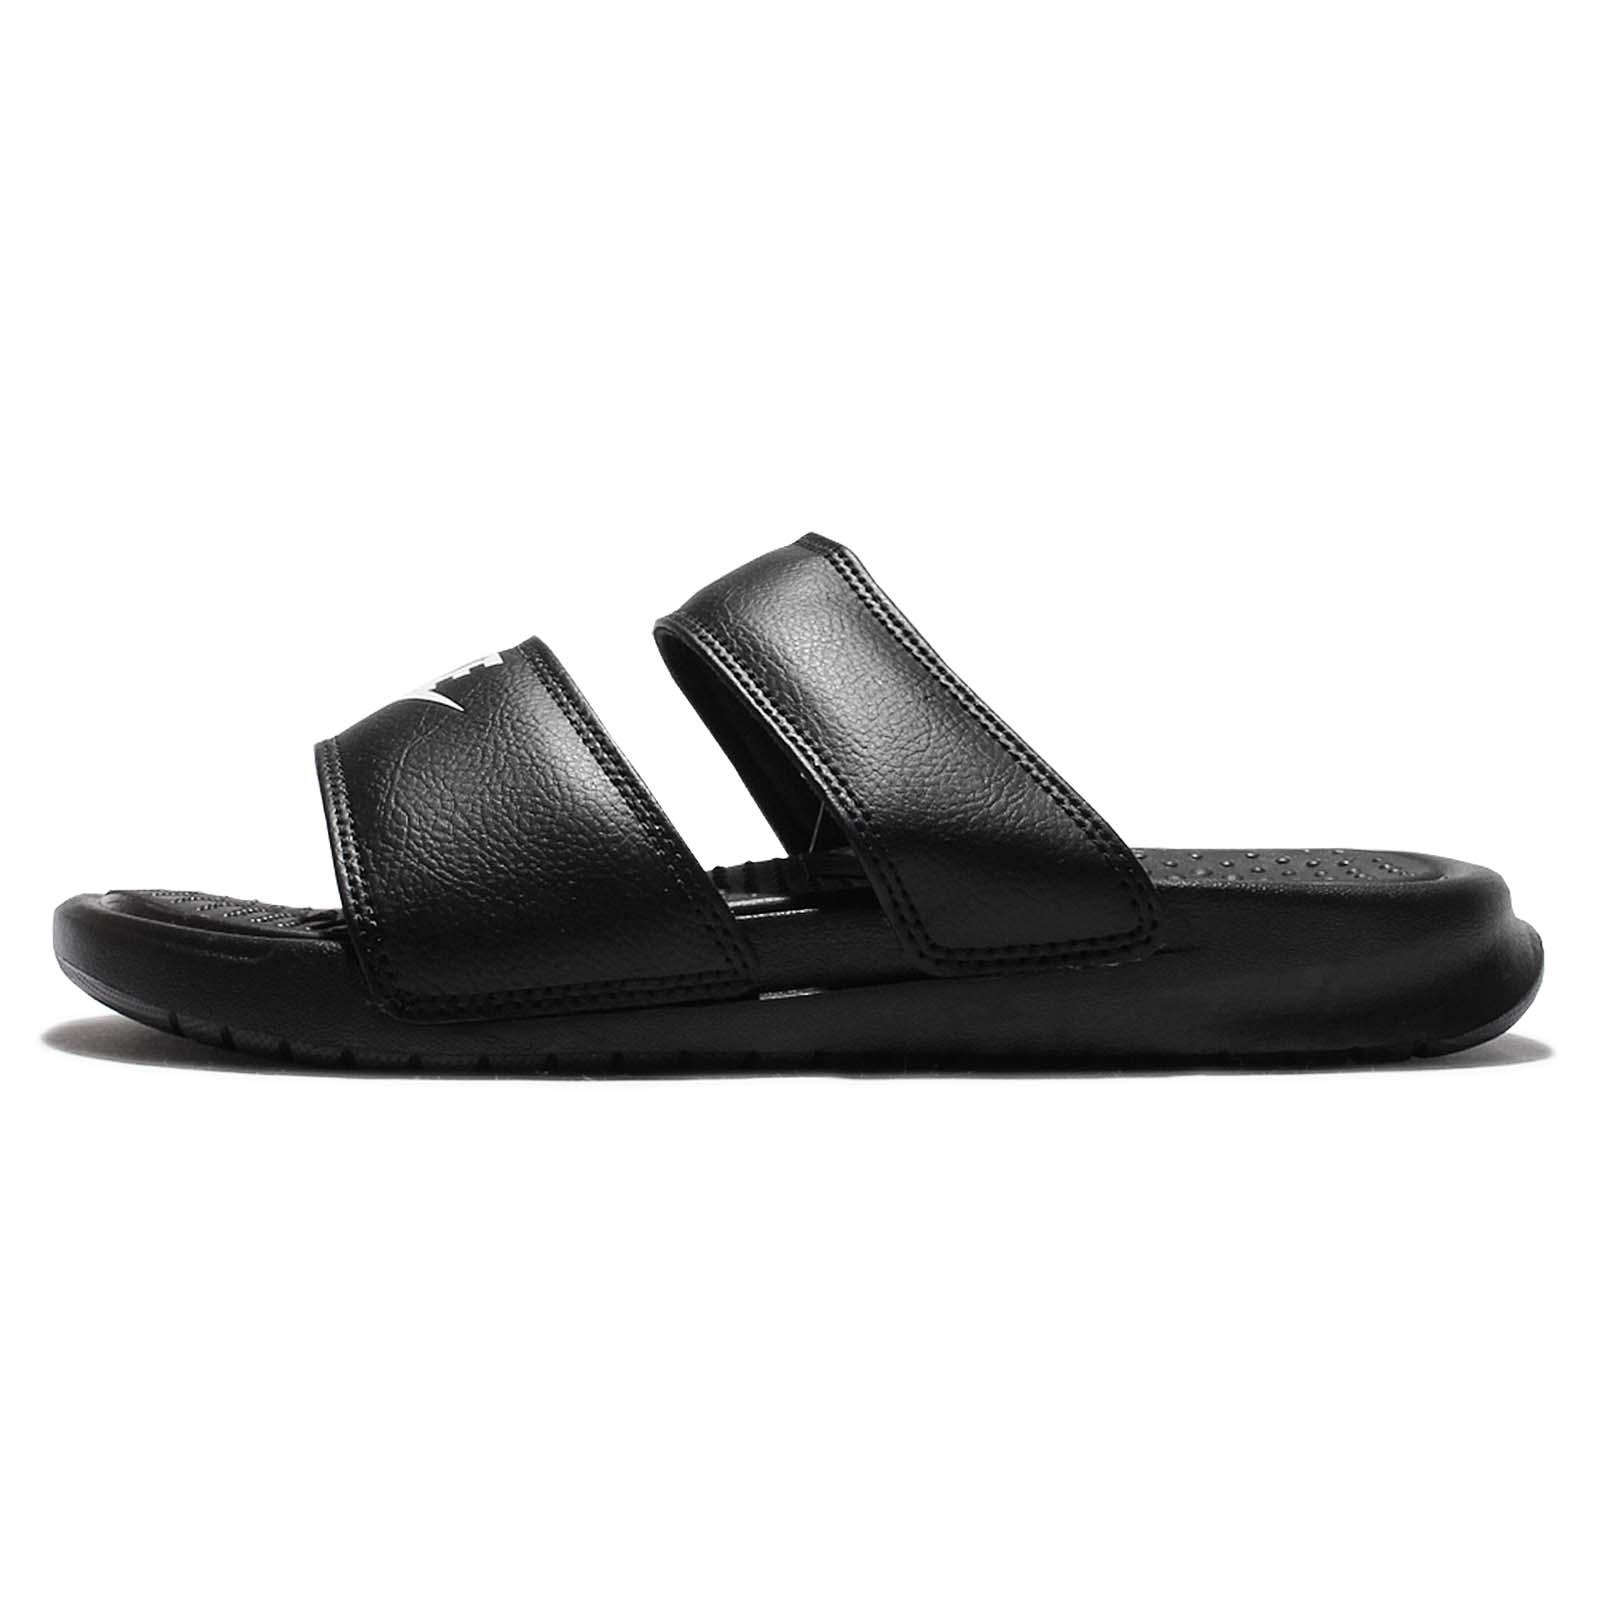 Nike 拖鞋 Benassi Duo Ultra Slide 黑 白 女鞋 涼拖鞋 【ACS】 819717-010